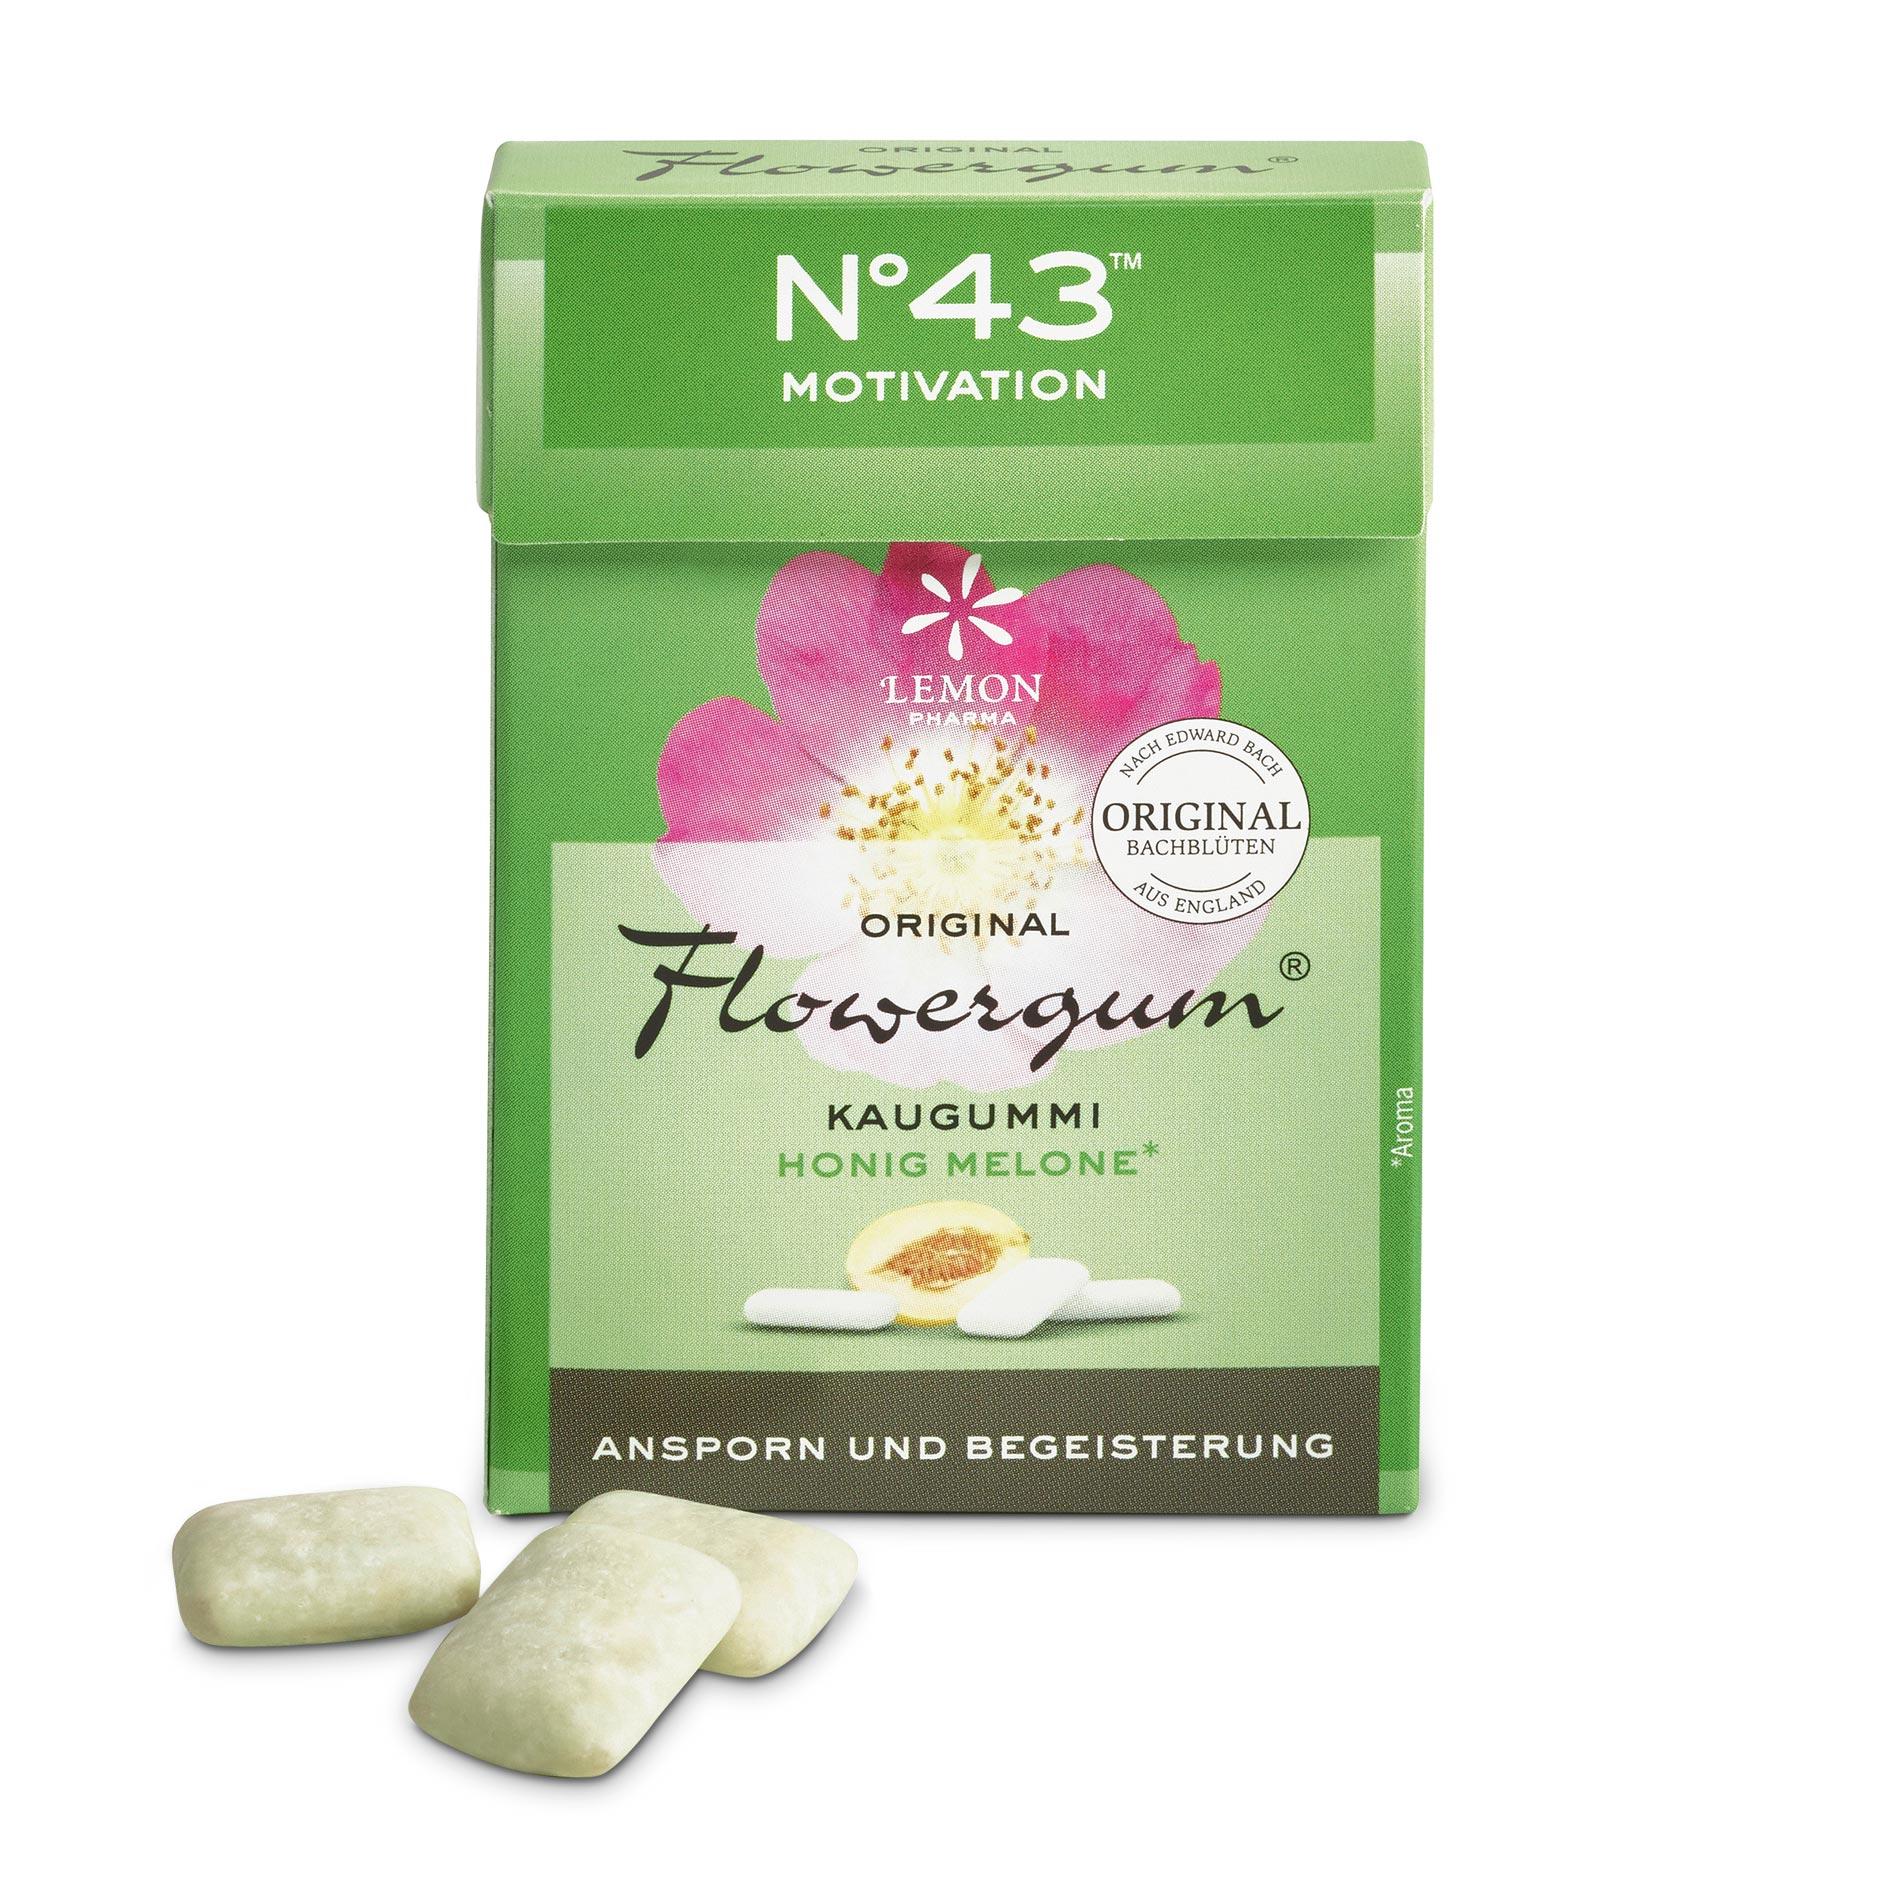 Flowergum 43 Motivation Lemon Pharma Original Bach Flowers Fleurs de Bach Motivation et enthousiasme Murnauer